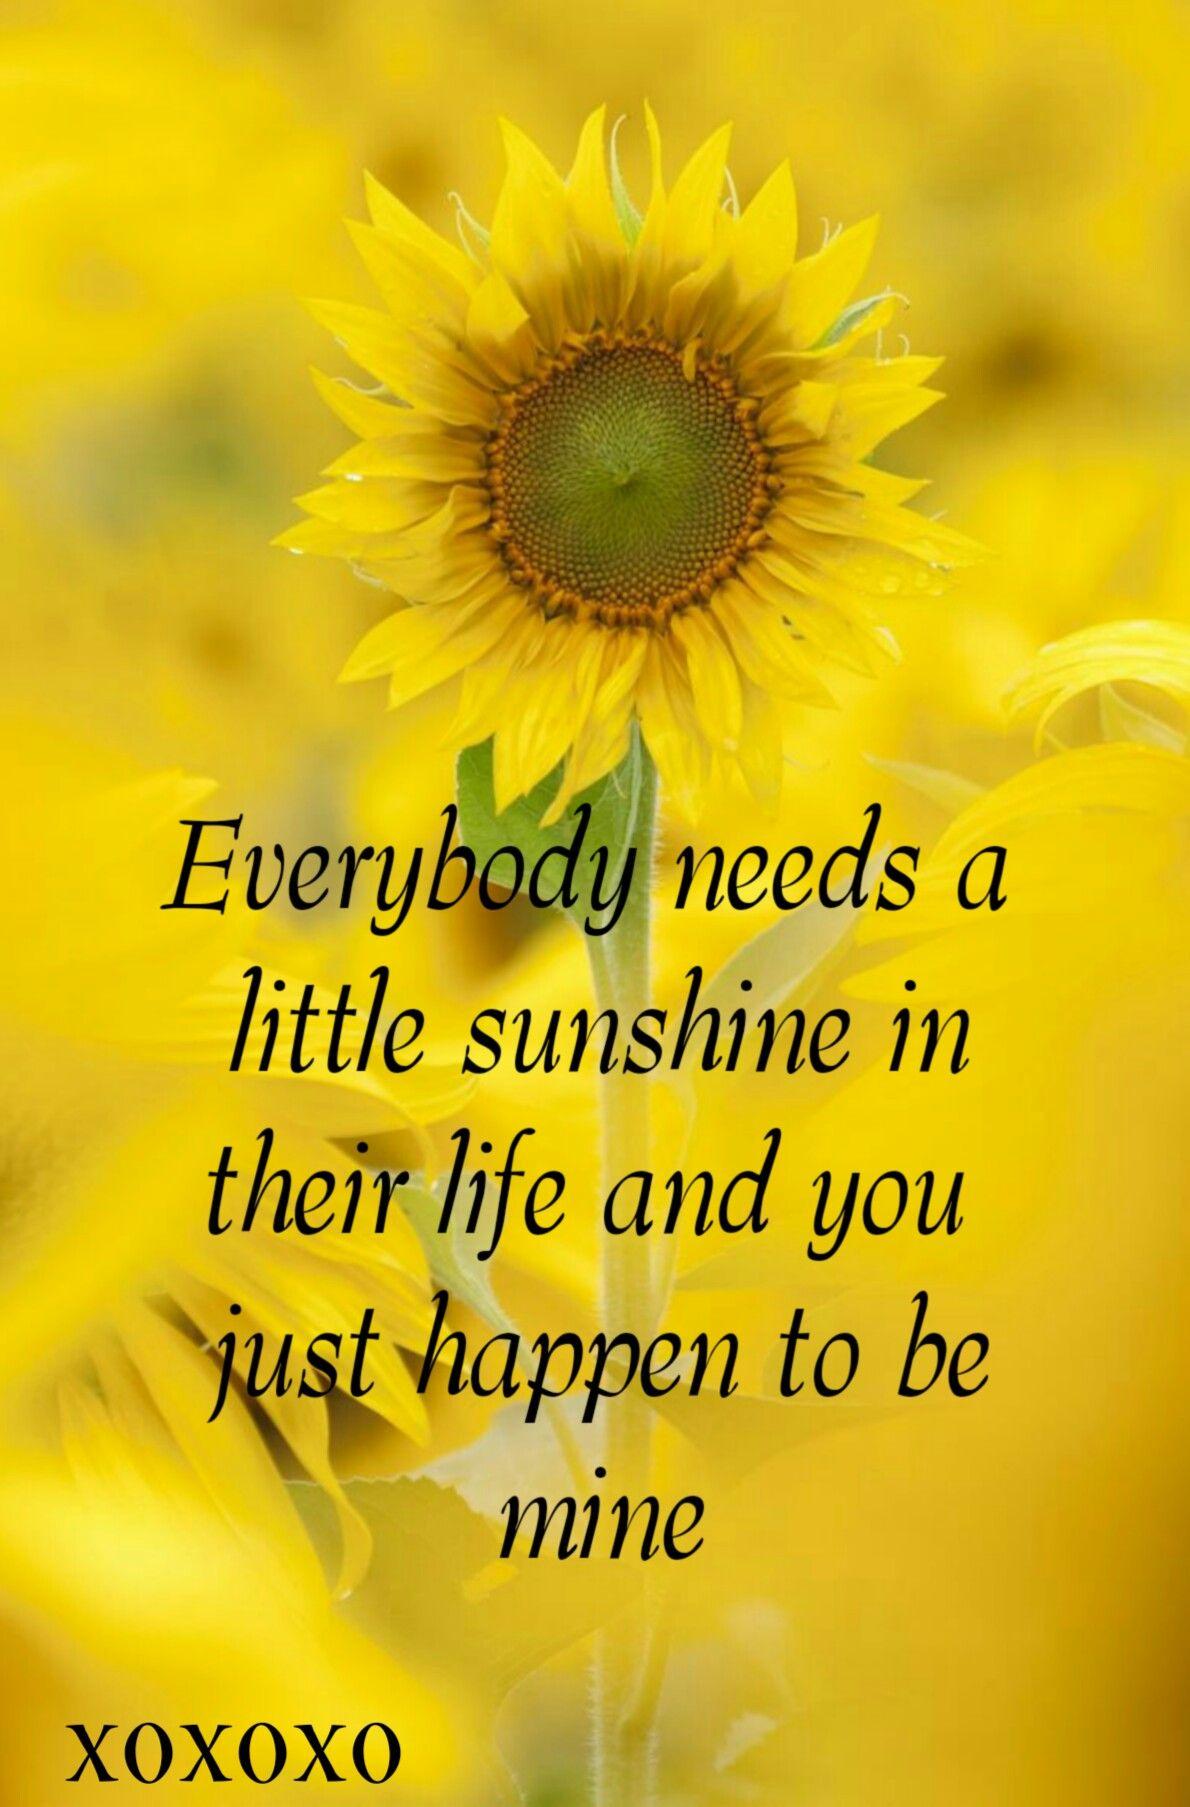 Chalkboard style greeting card Inspirational Card My Sunshine! Sunflower